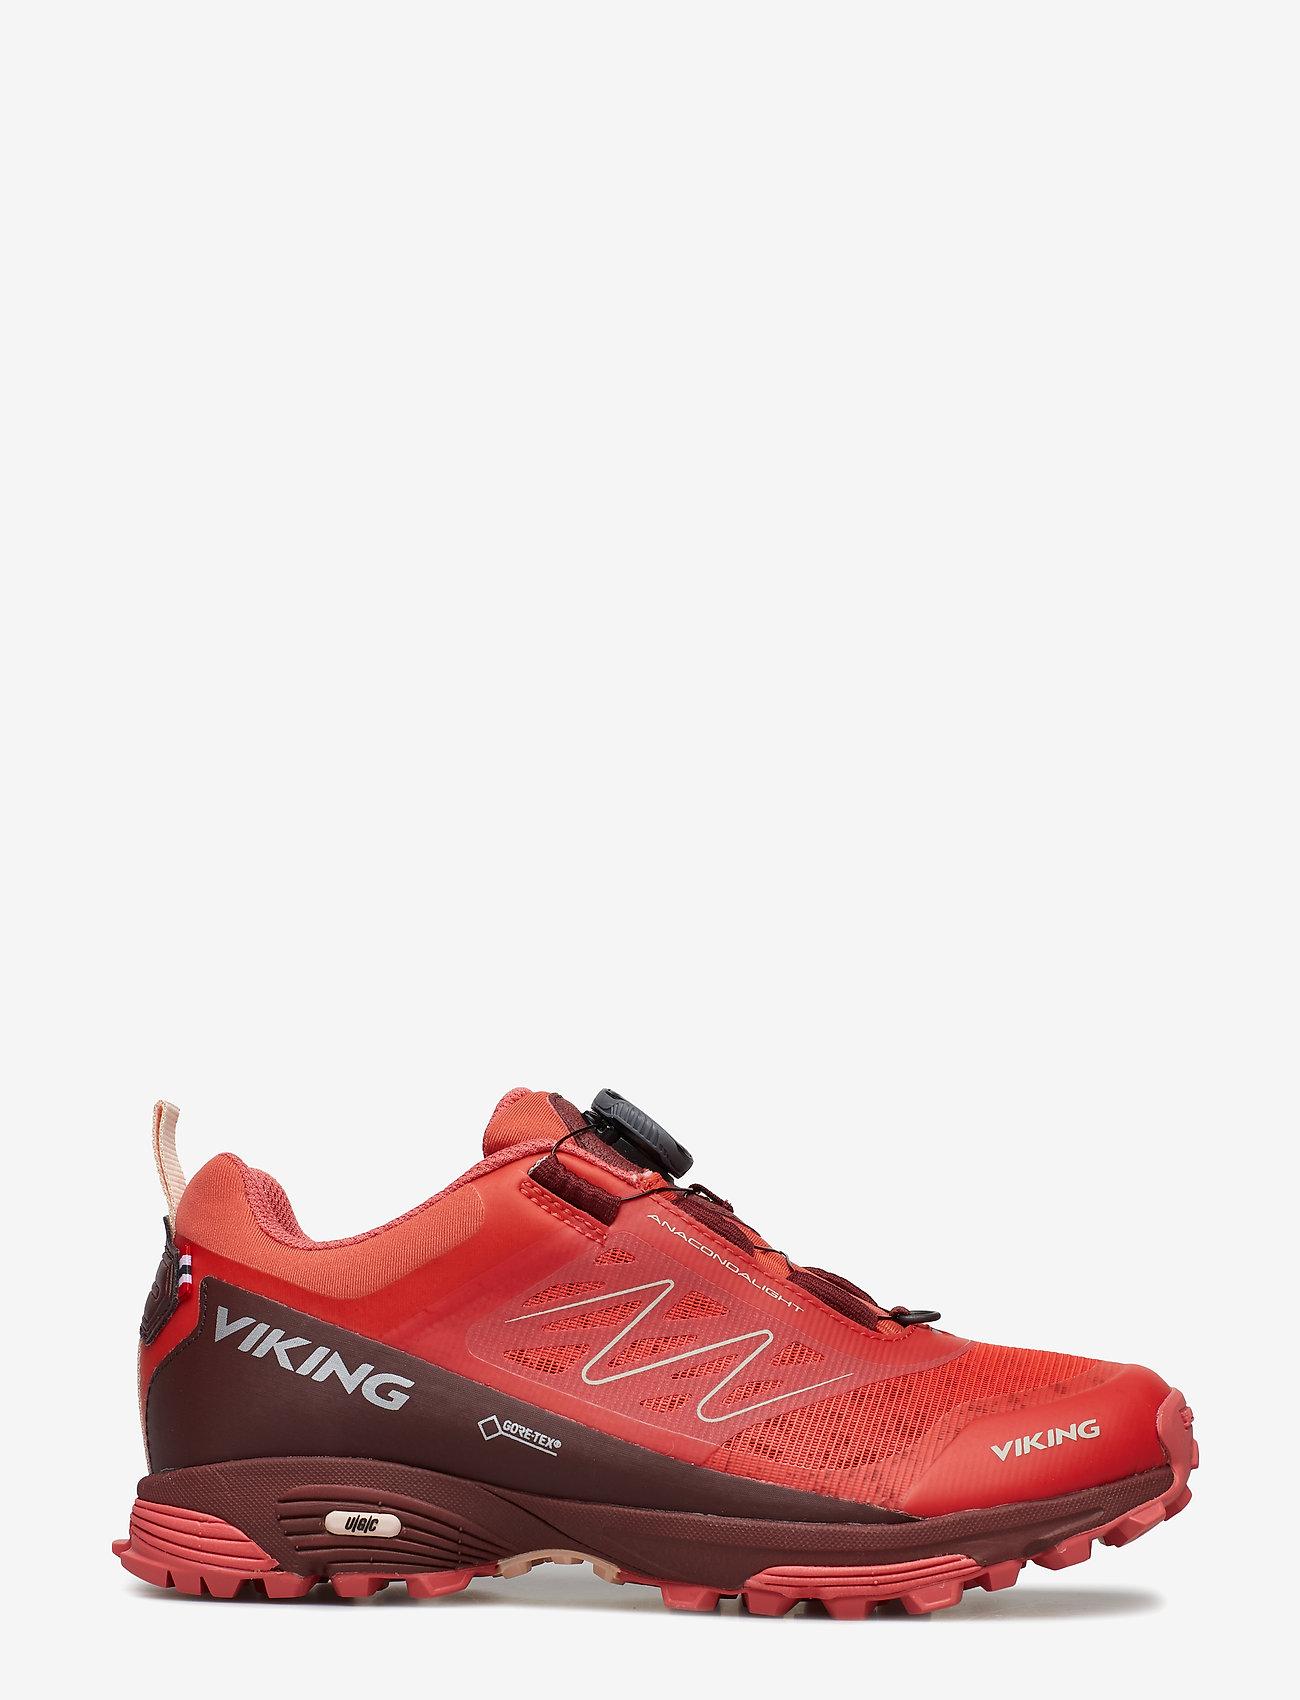 Viking - Anaconda Light Boa GTX - running shoes - dk.pink/bordeaux - 1